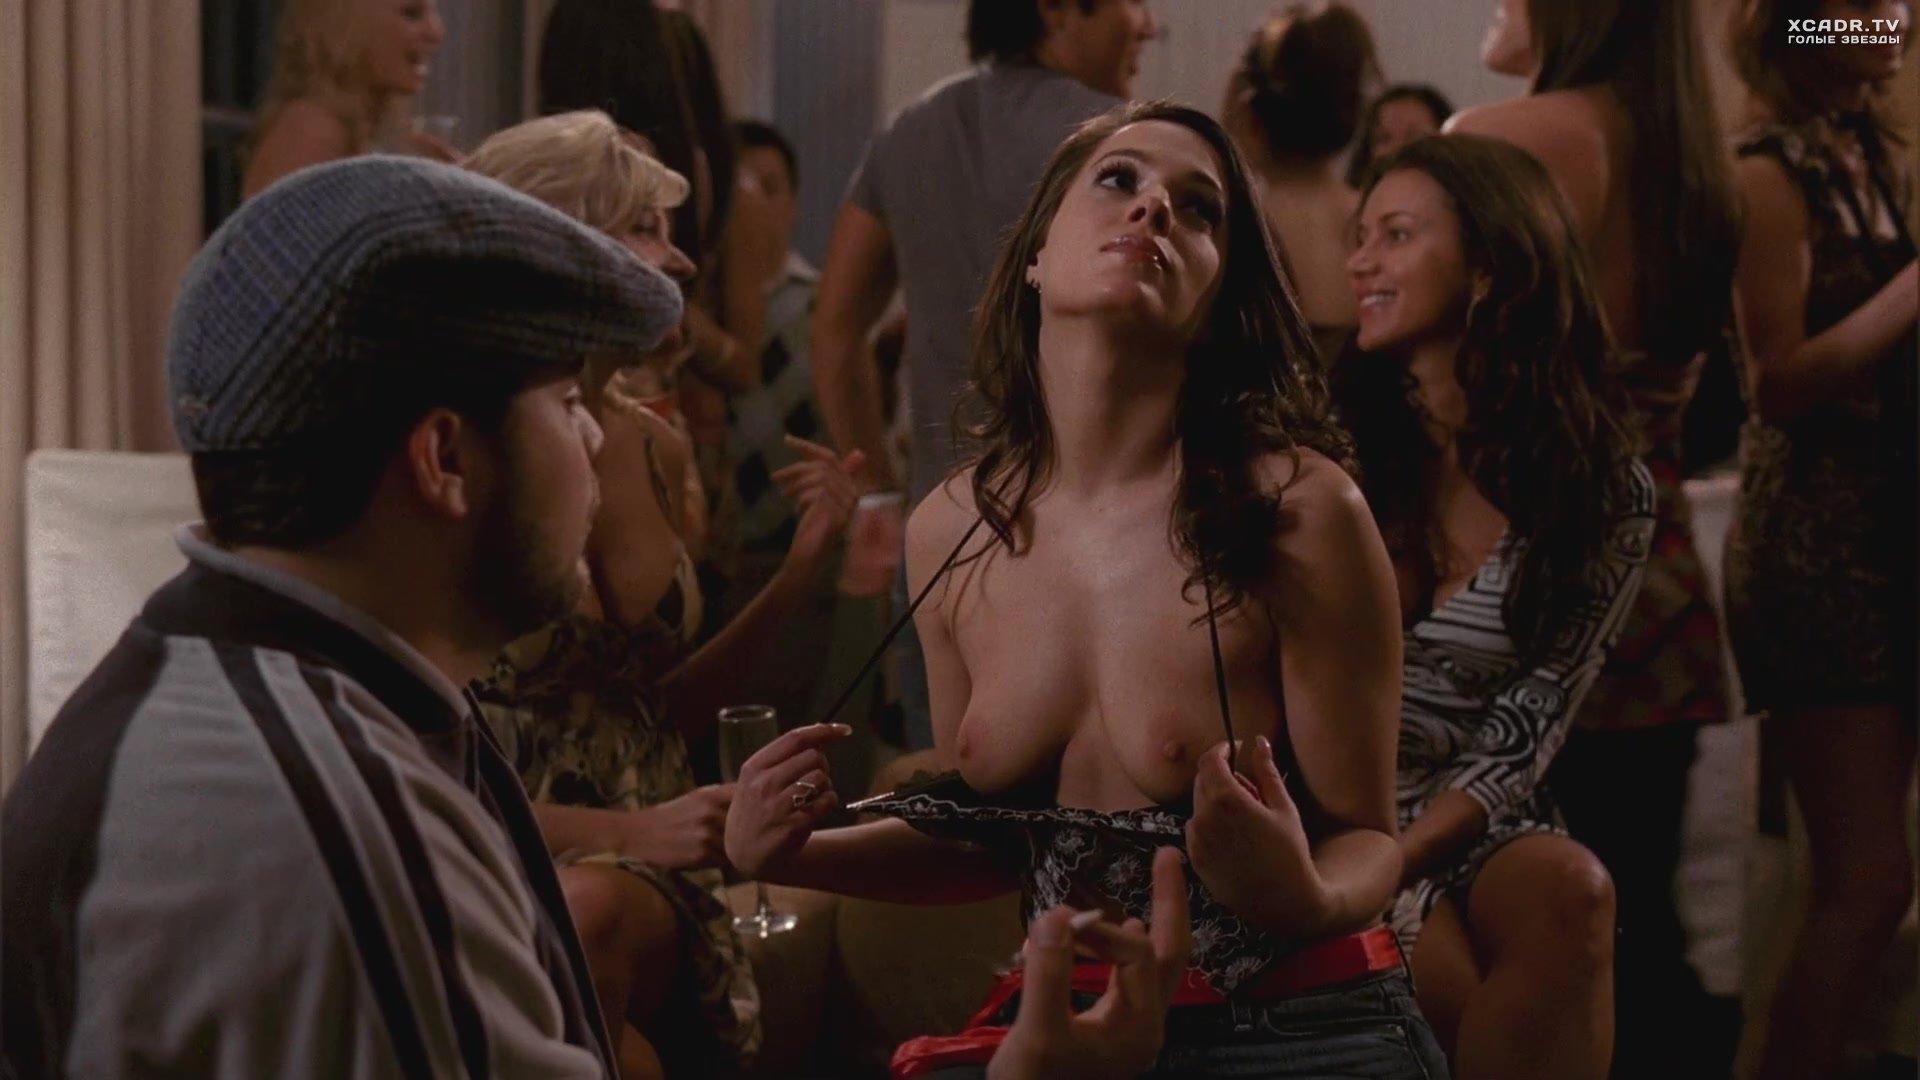 Mila kunis naked leaked pics and nude sex scenes